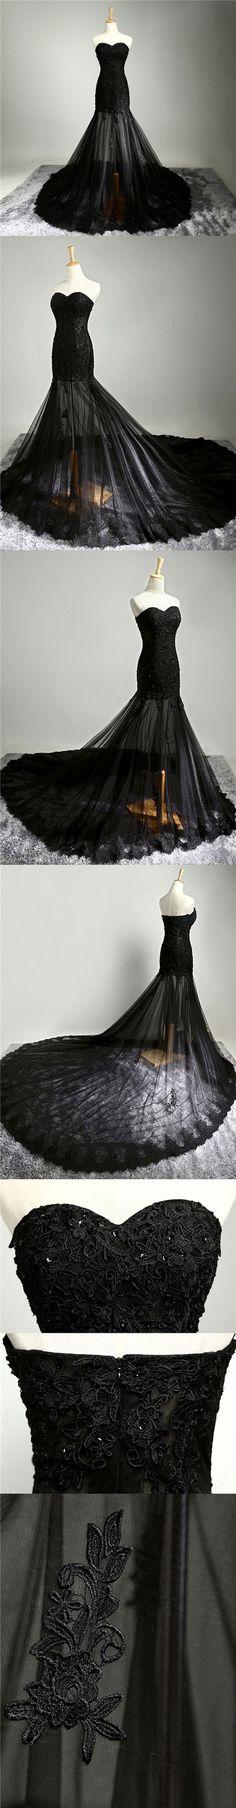 Black Sexy Prom Dresses Sweetheart Sheath/Column Prom Dress/Evening Dress JKL048